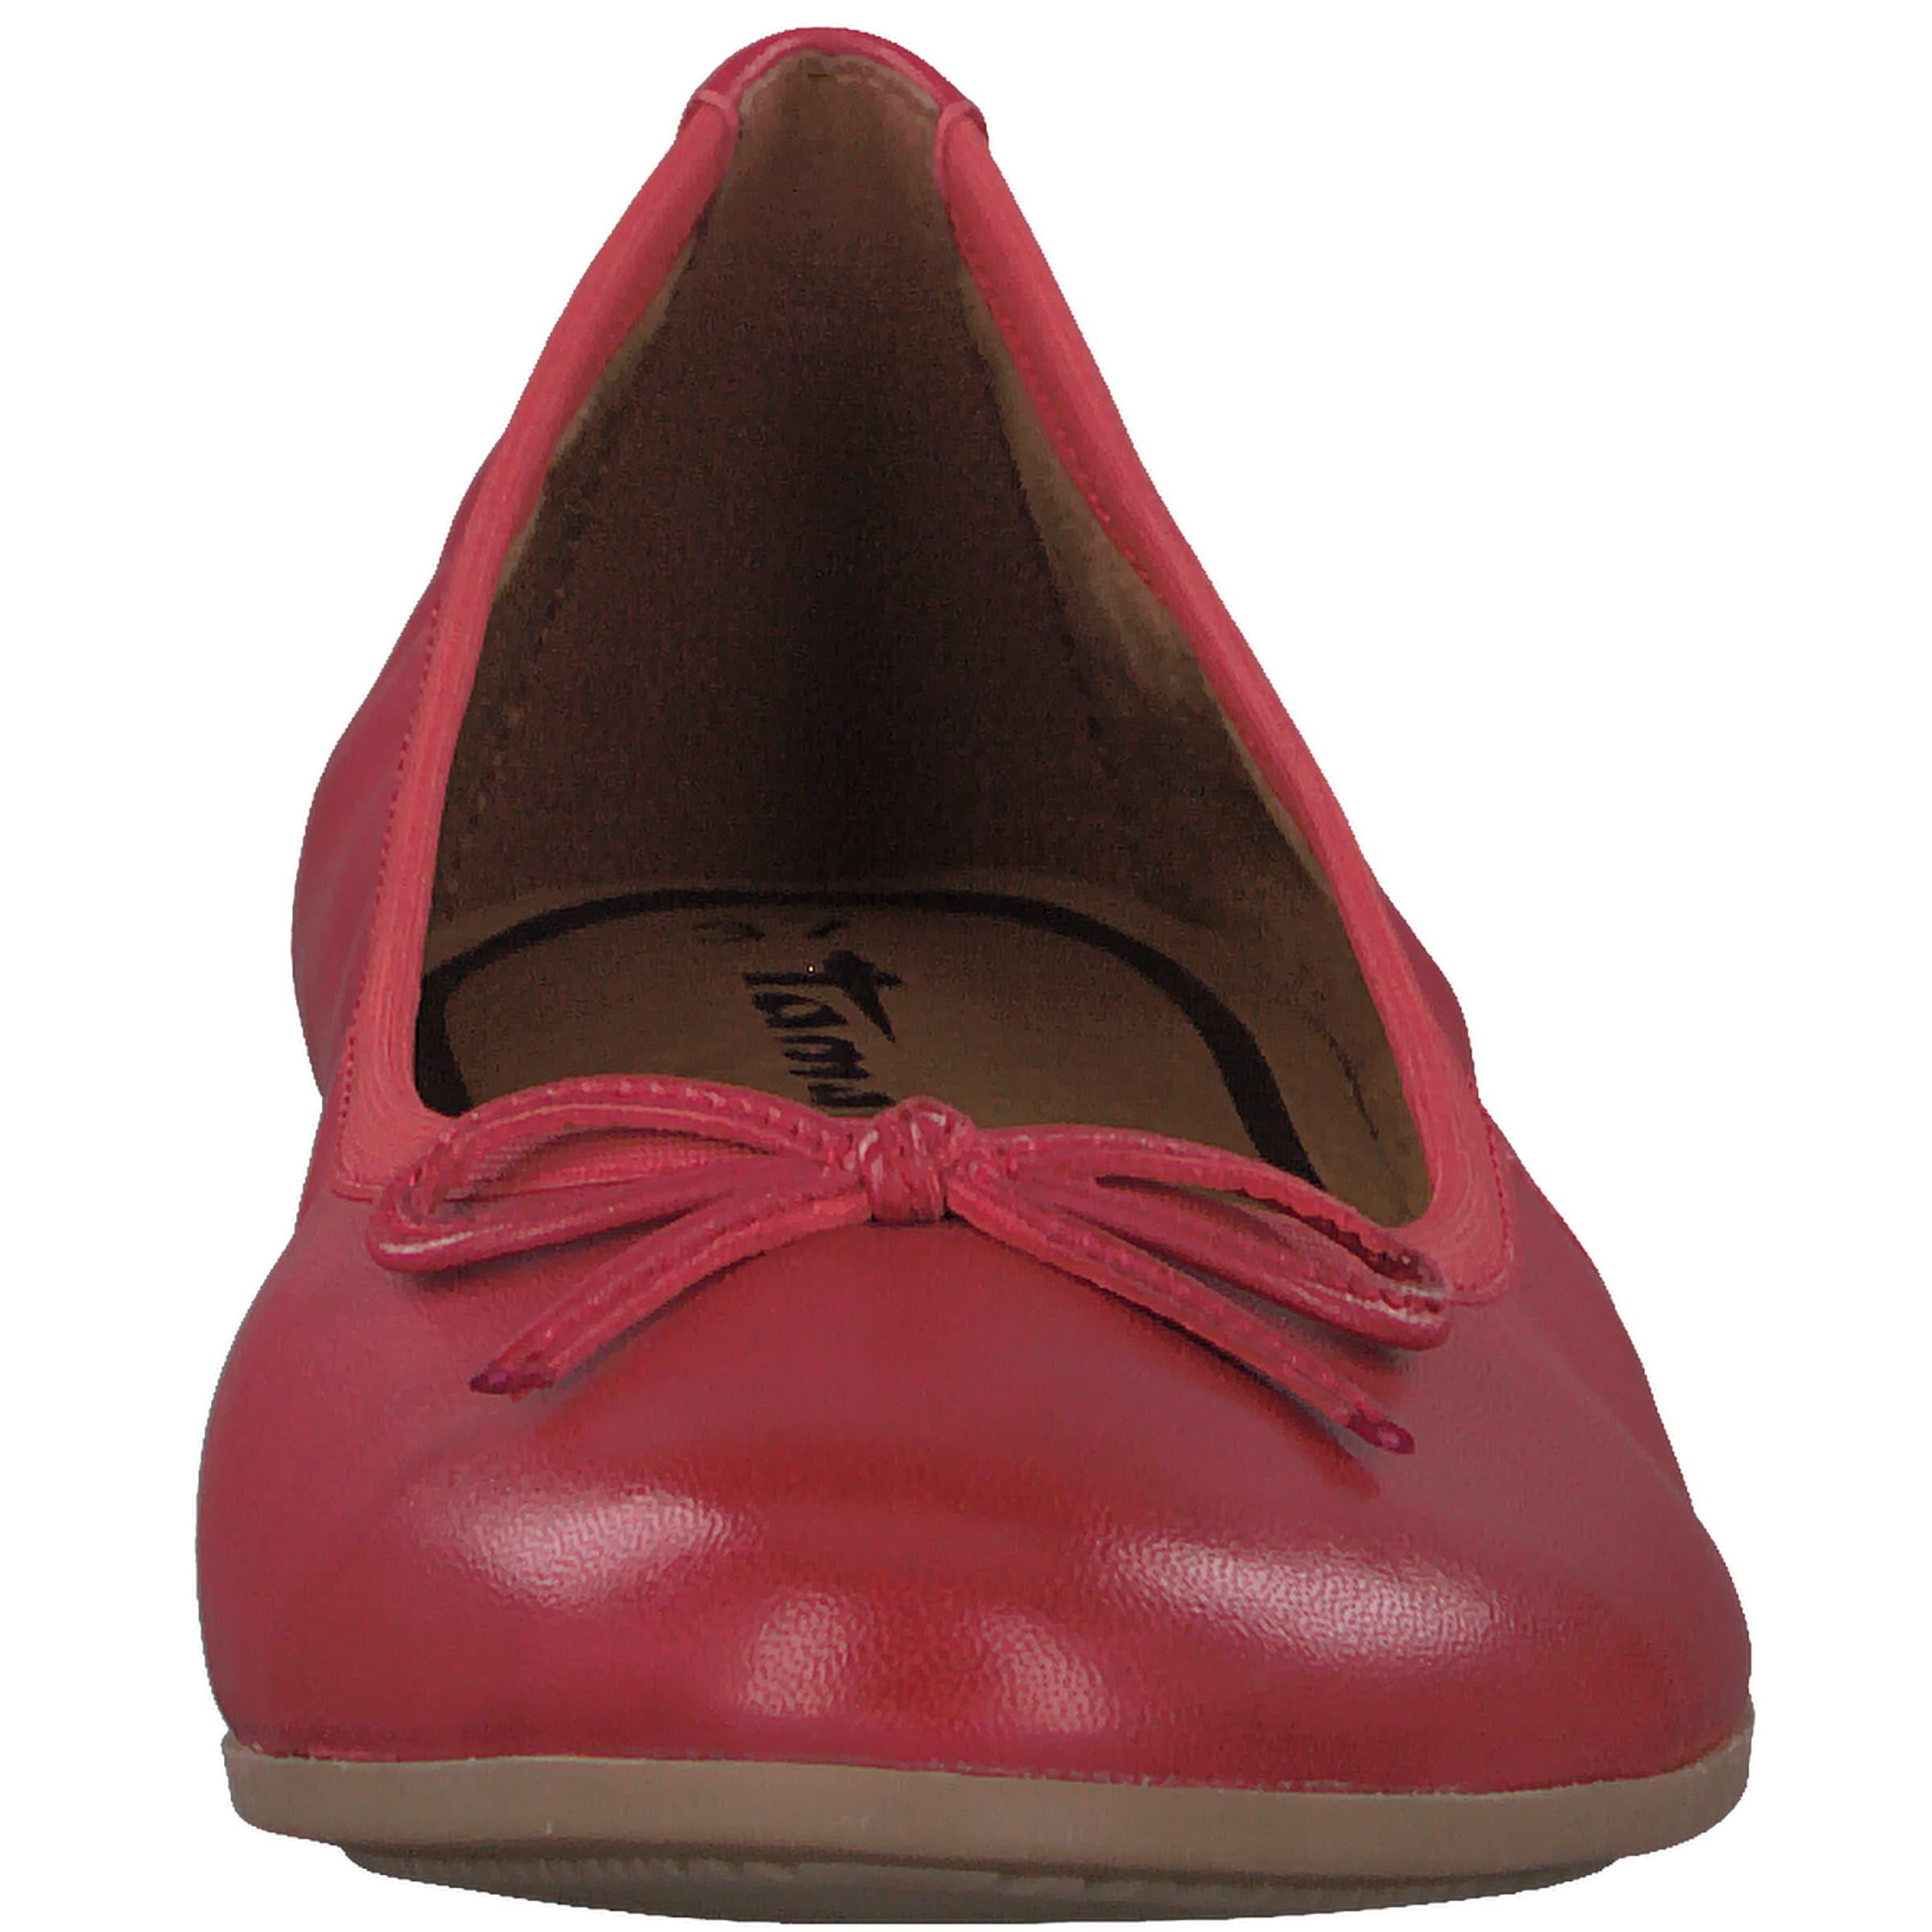 Ballerina Tamaris Rot In Rot Tamaris In Ballerina Tamaris tCQdshrx